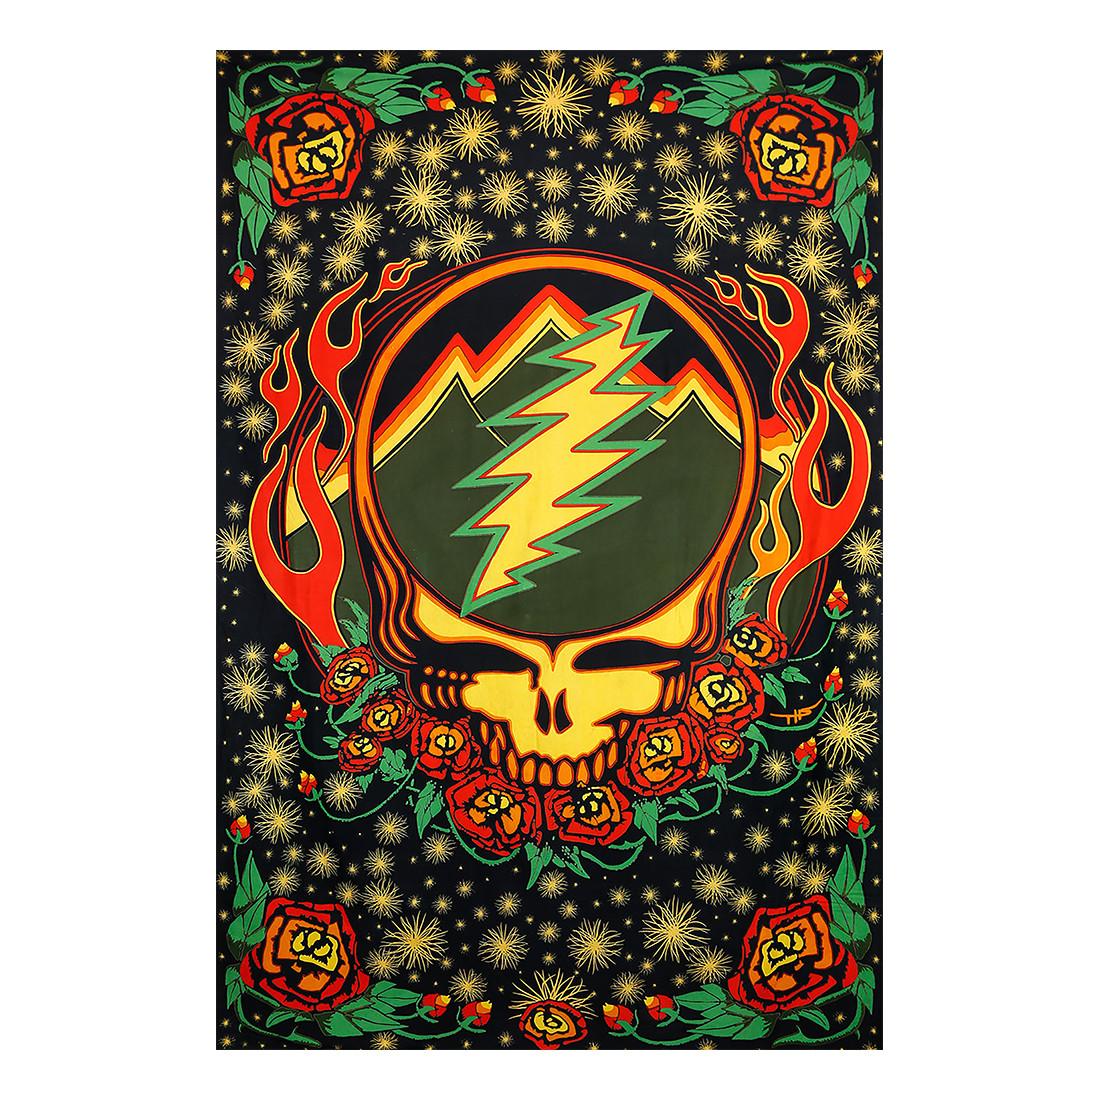 GD Scarlet Fire SYF 3D Tapestry